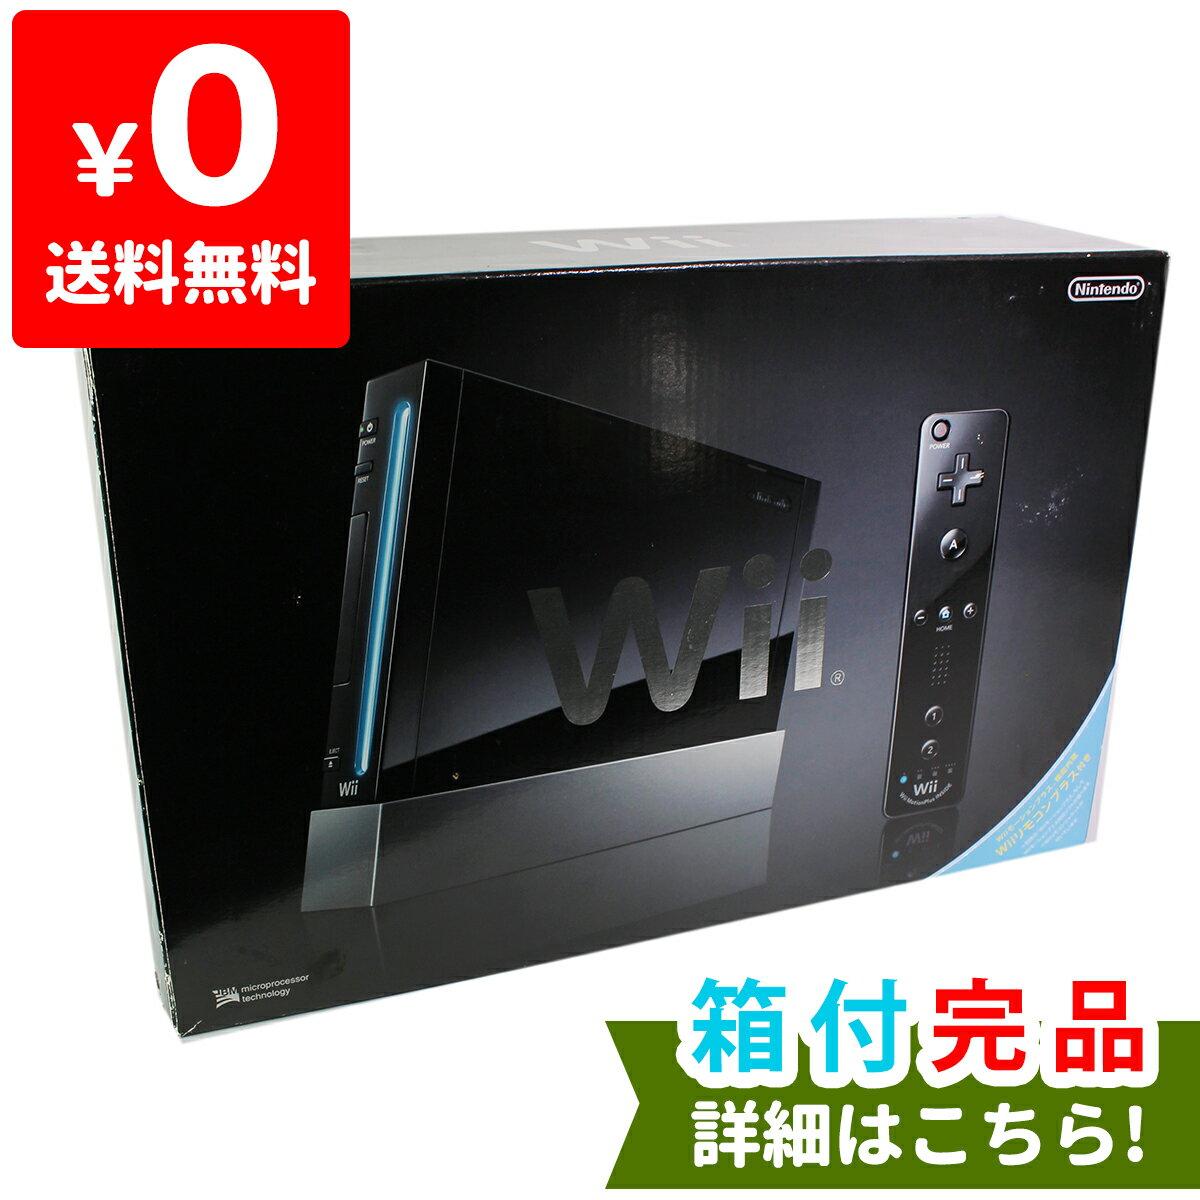 Wii ニンテンドーWii 本体 クロ 黒 Wiiリモコン 同梱 本体 完品 外箱付き 任天堂 ニンテンドー 中古 4902370517811 送料無料